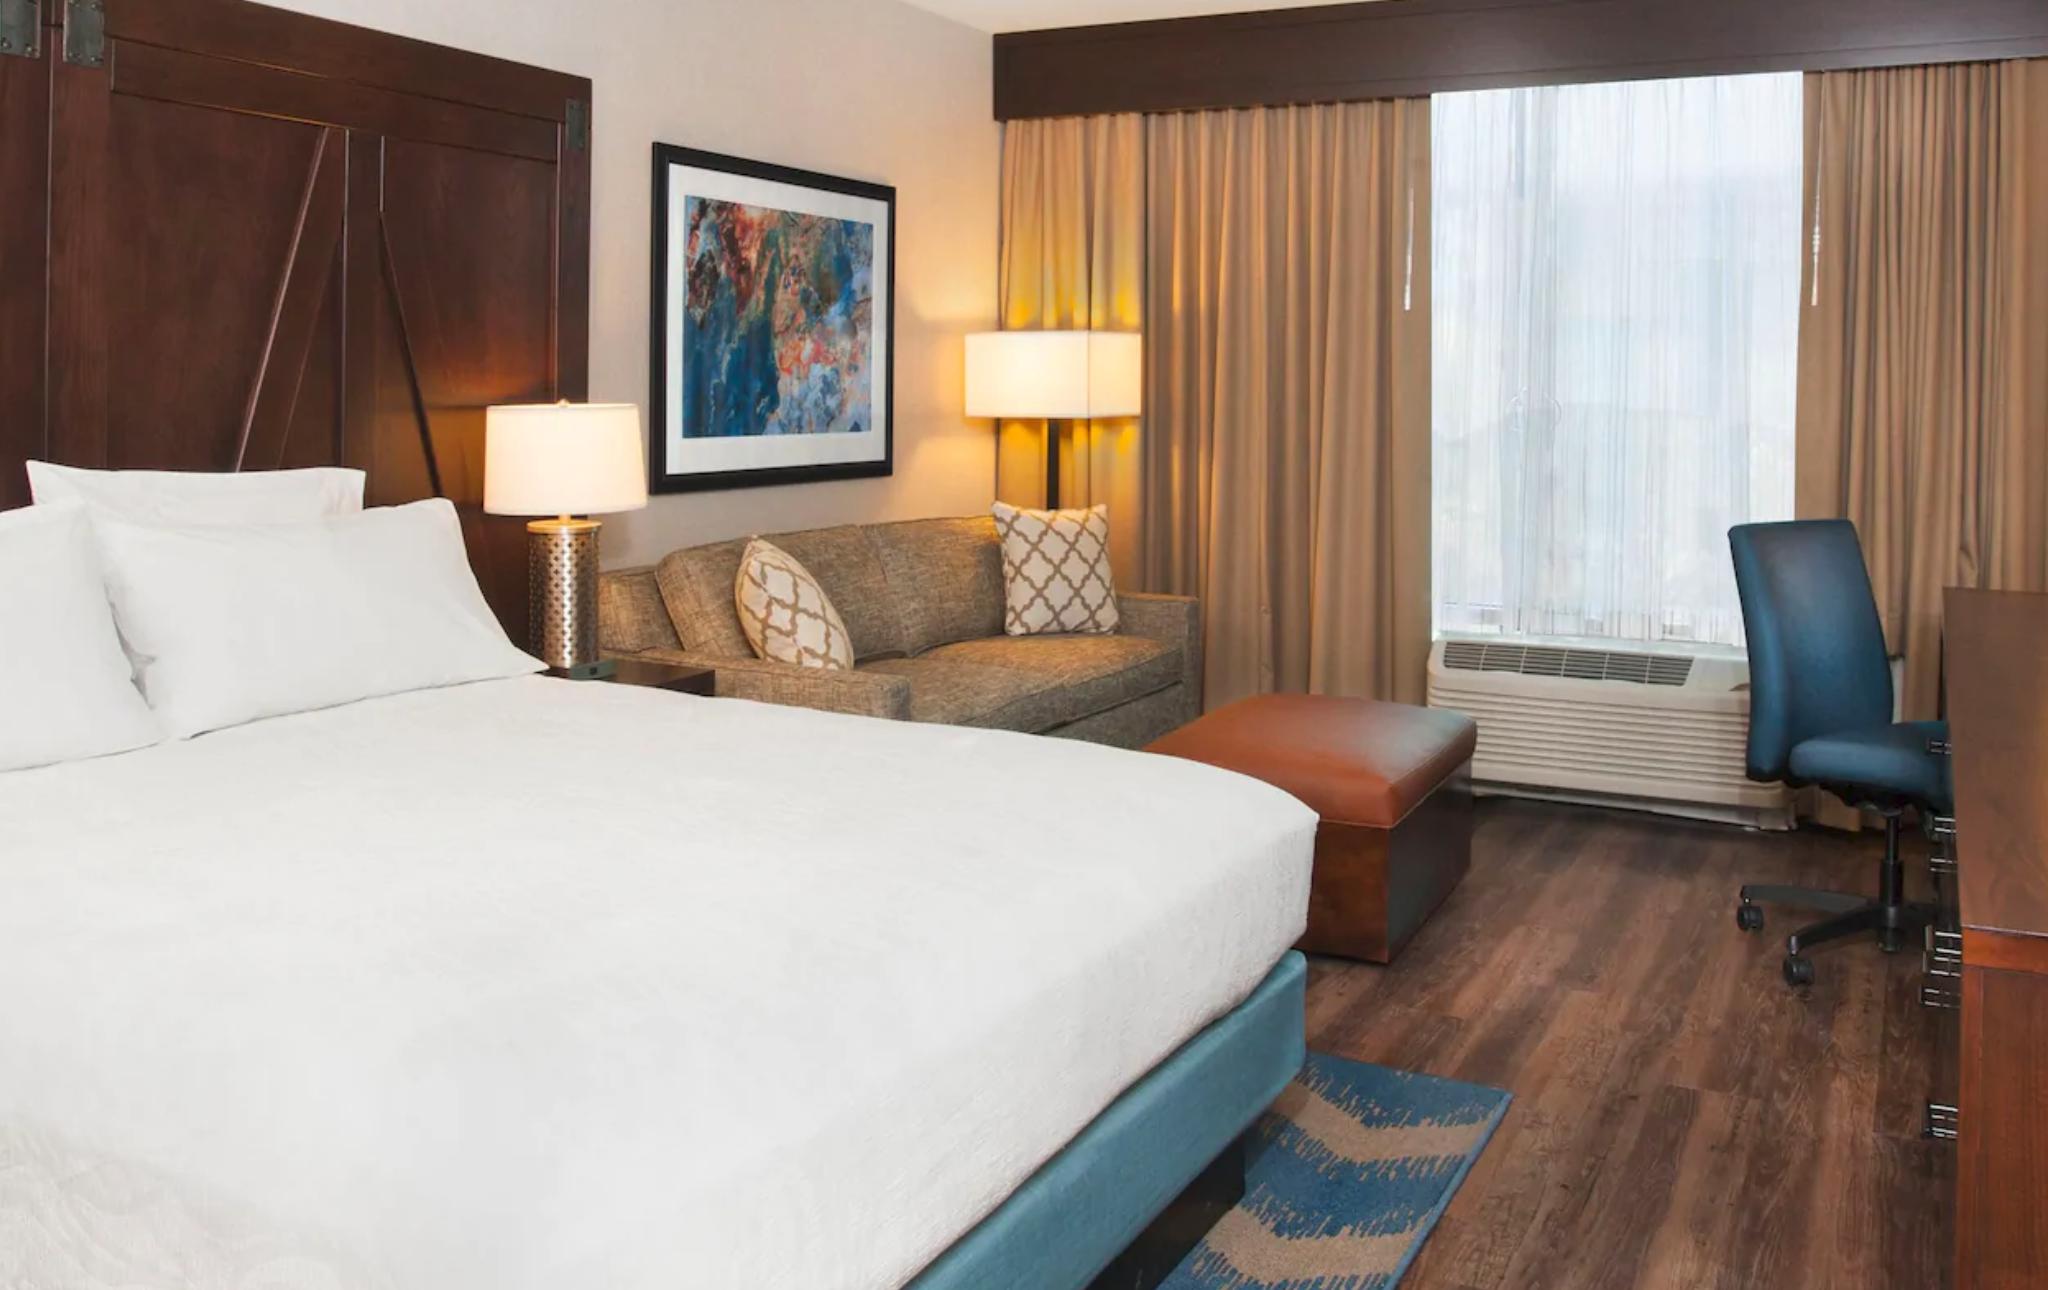 https://www.hotelsbyday.com/_data/default-hotel_image/4/21566/screenshot-2020-08-30-at-10-31-47-pm.png